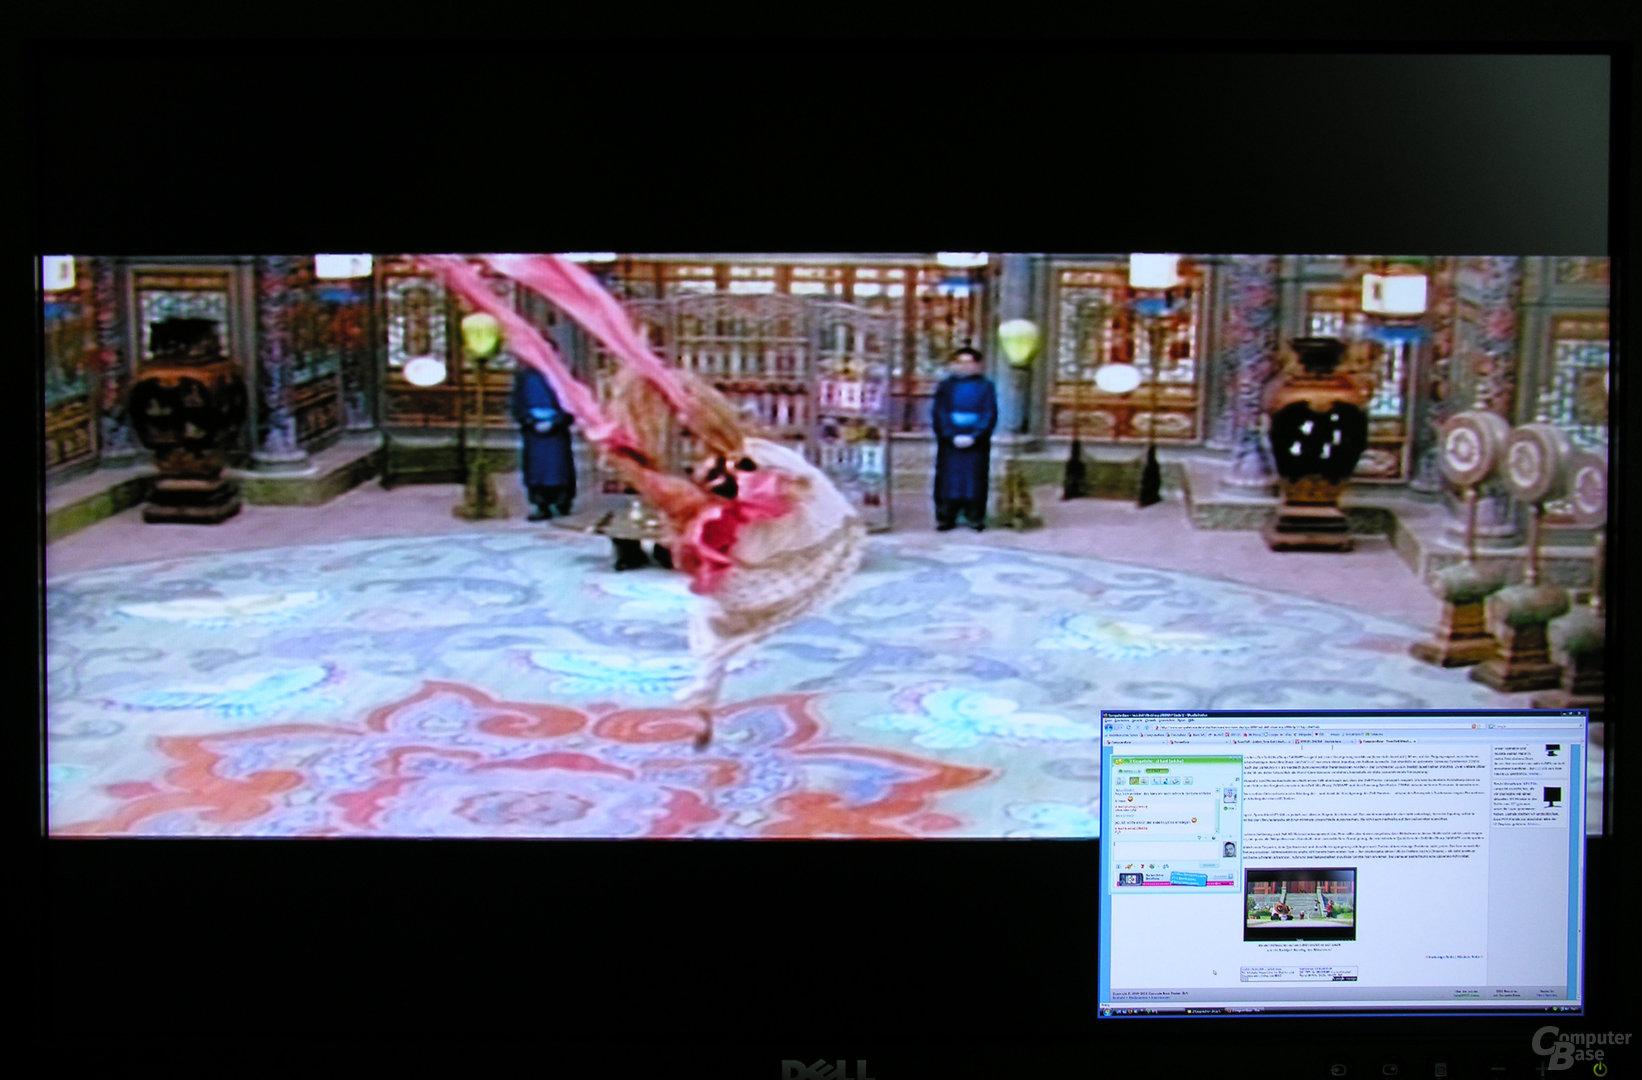 PiP-Modus (S-Video groß - DVI klein)